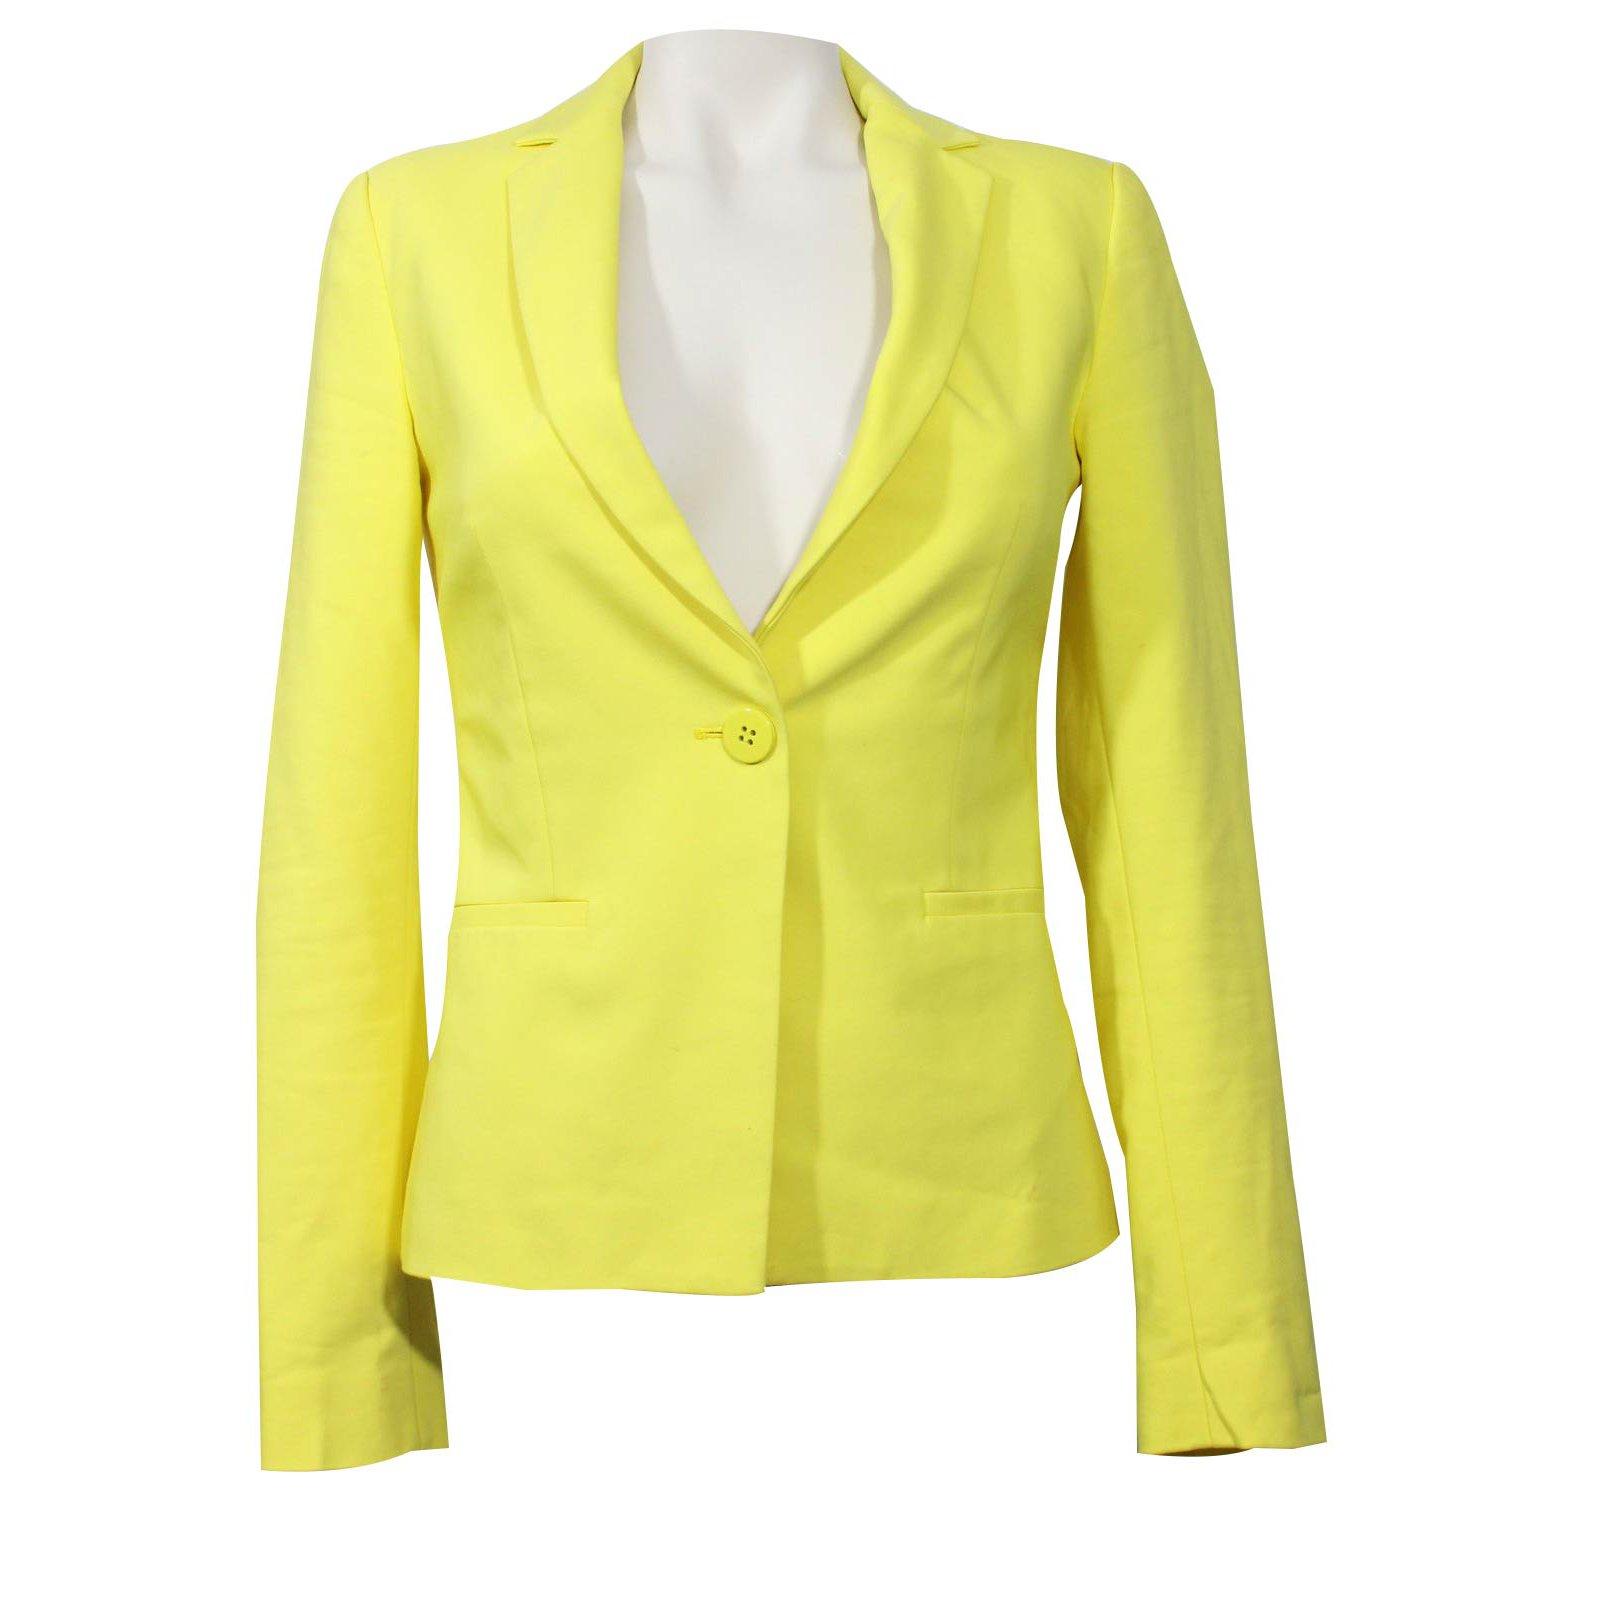 blazer femme zara jaune. Black Bedroom Furniture Sets. Home Design Ideas